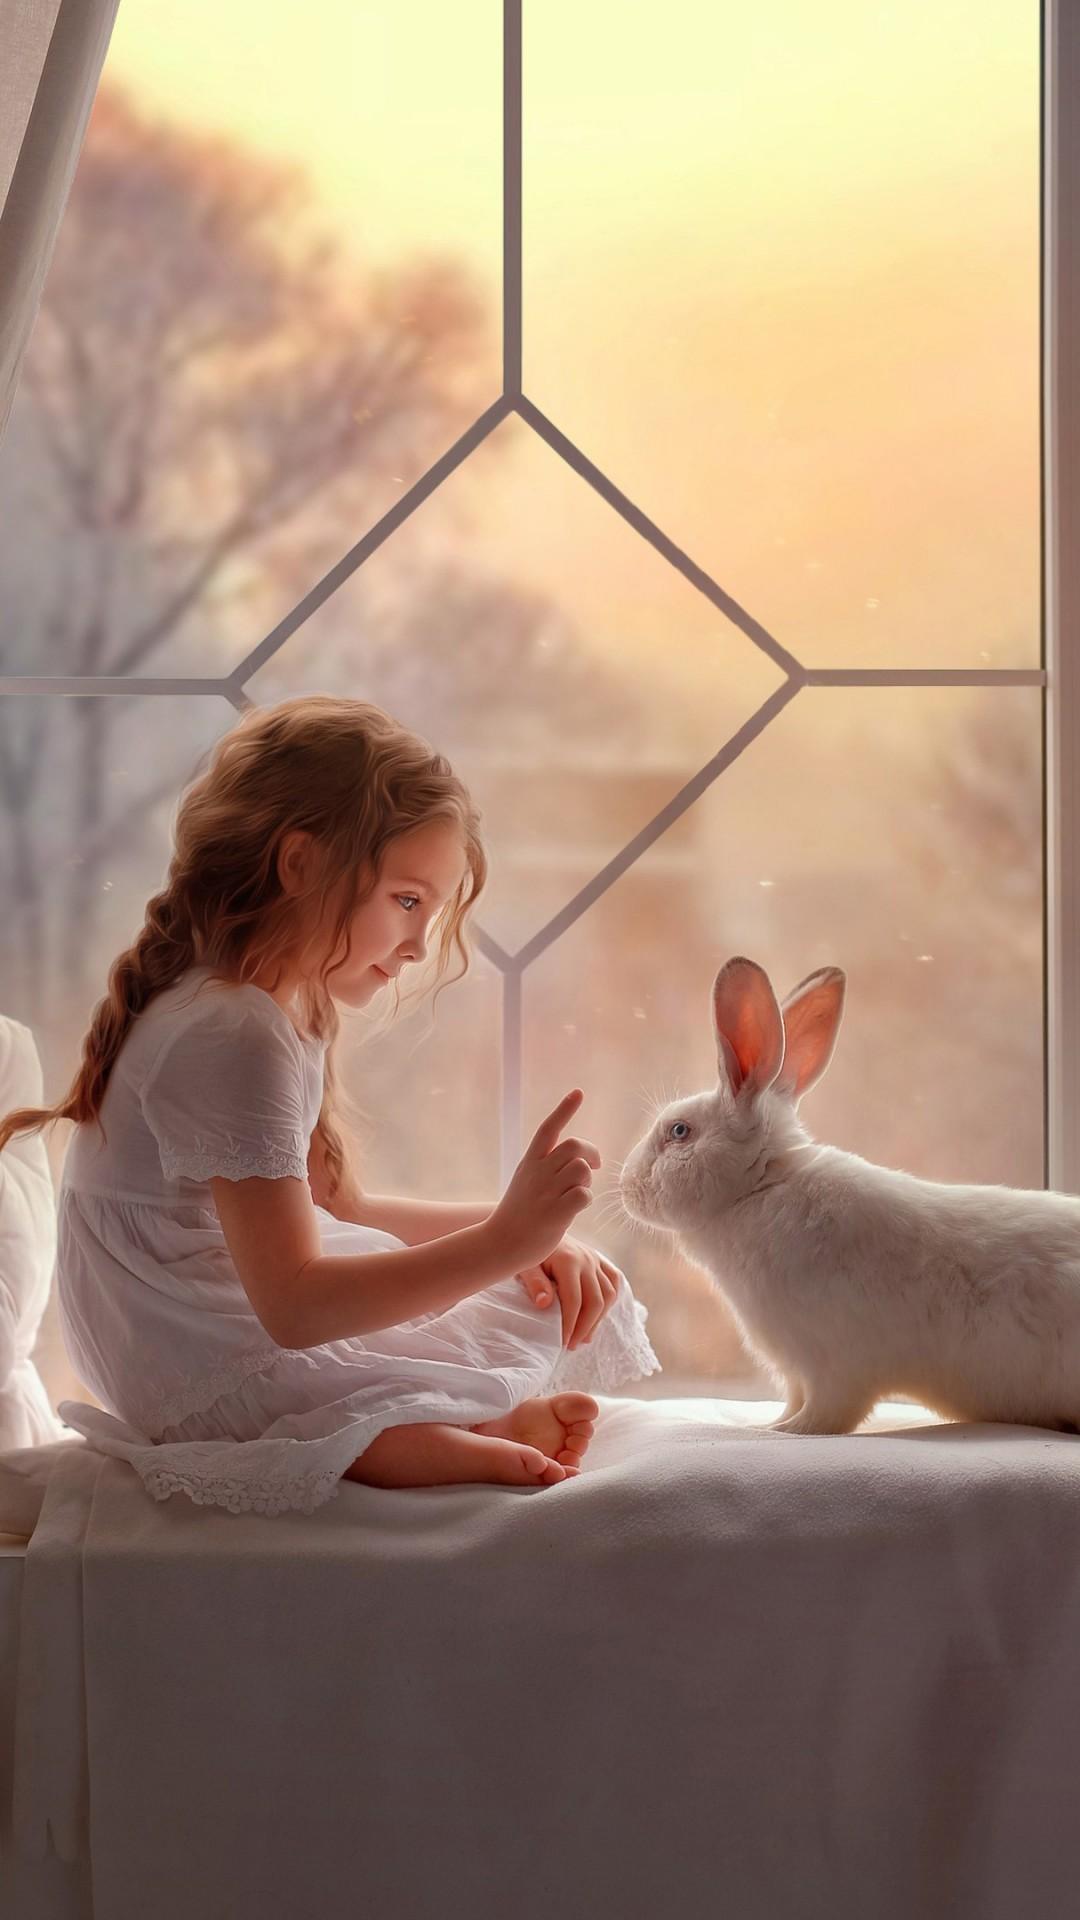 Free Cute girl and Rabbit phone wallpaper by rashad23a